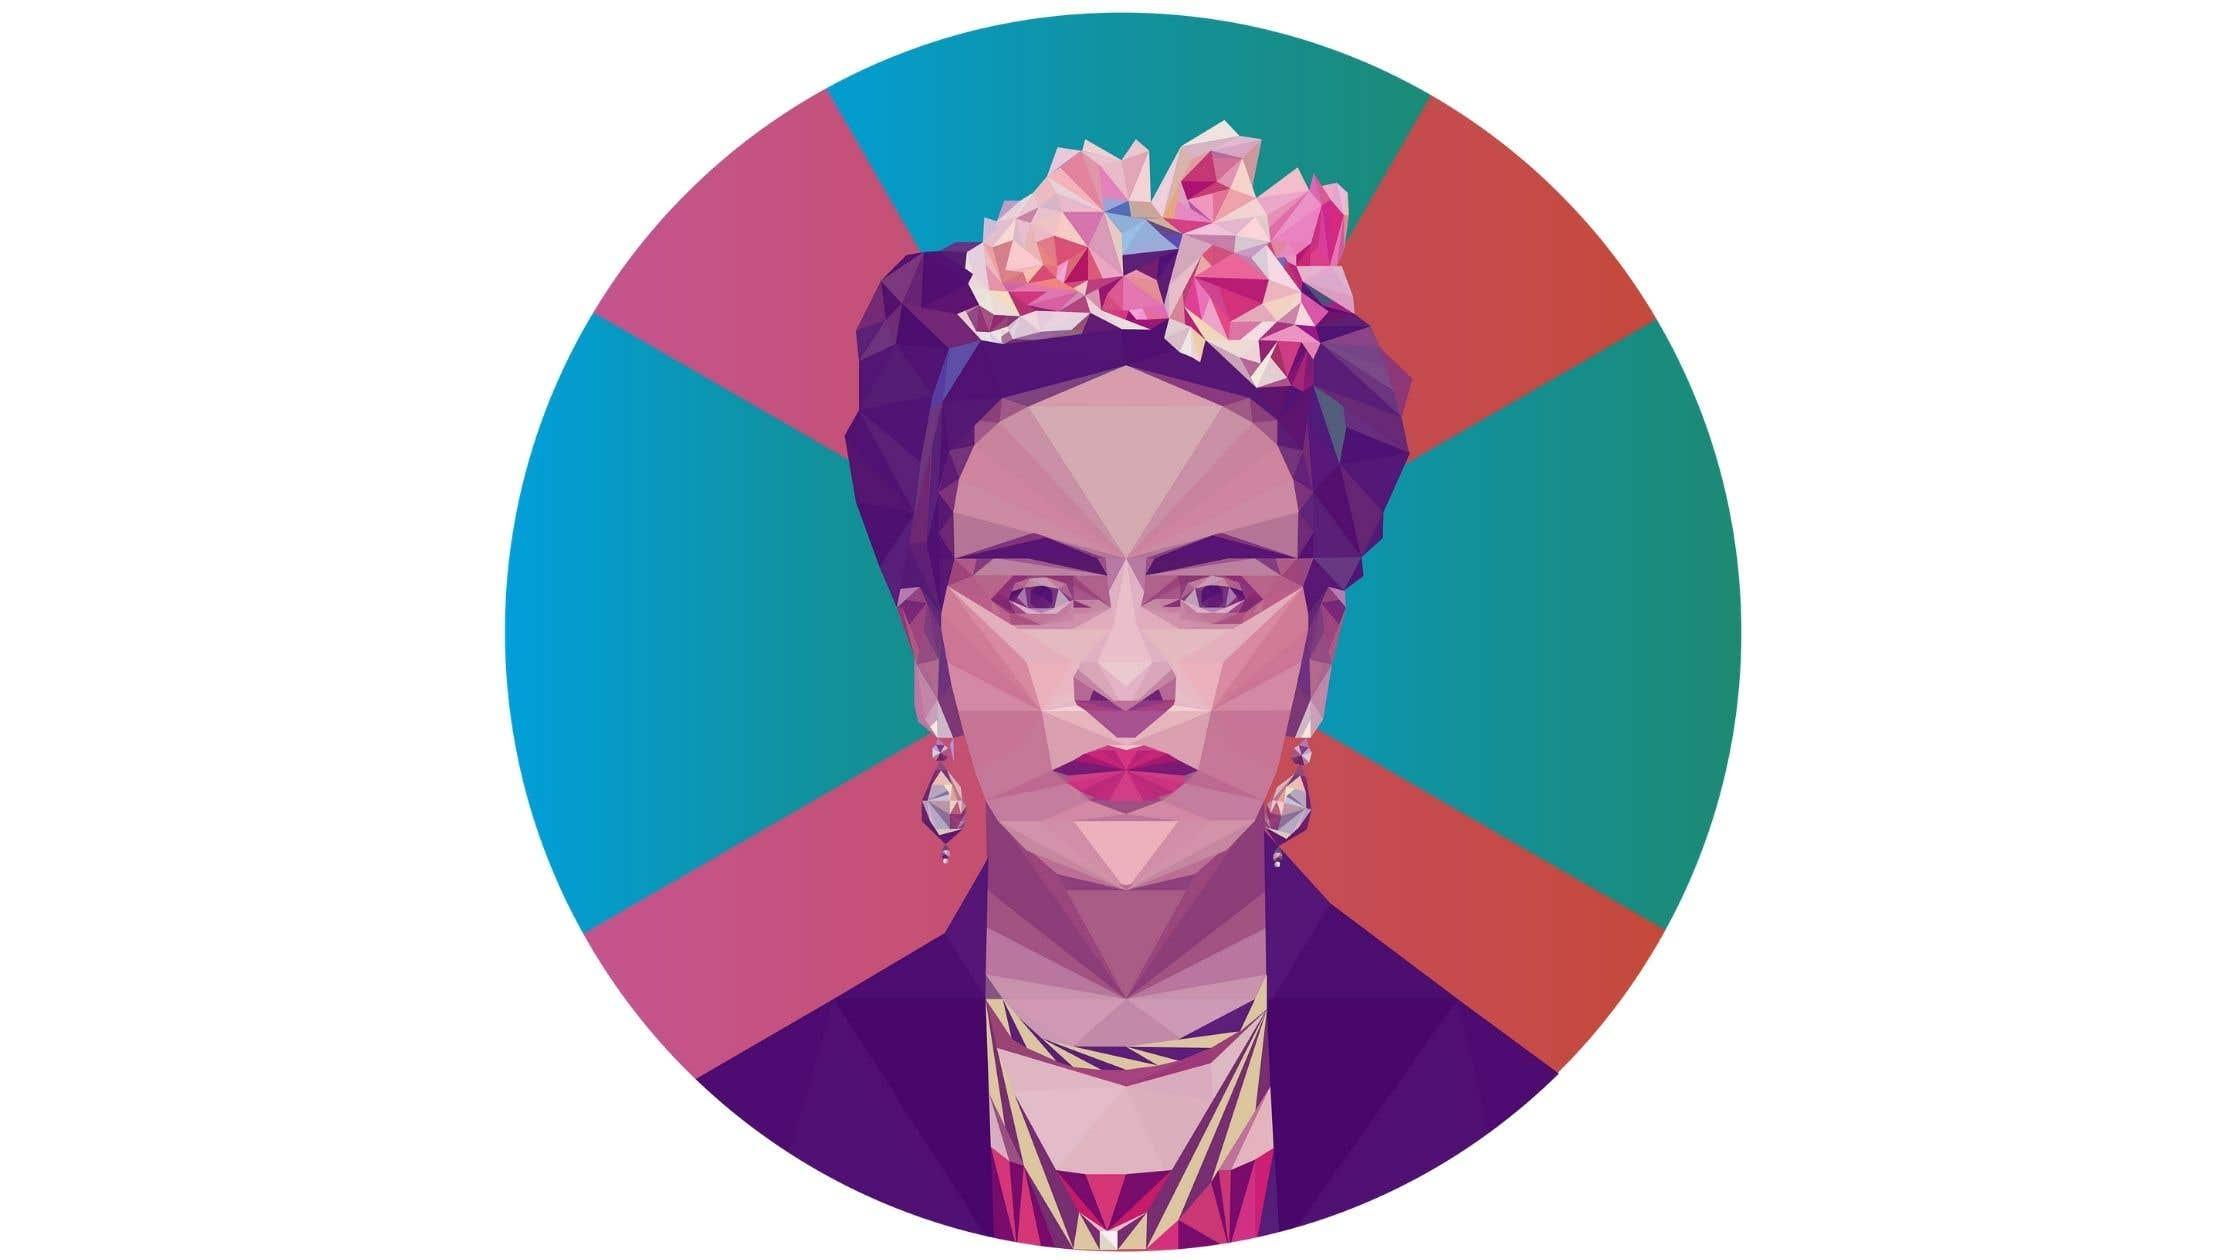 Frida Kahlo low poly art